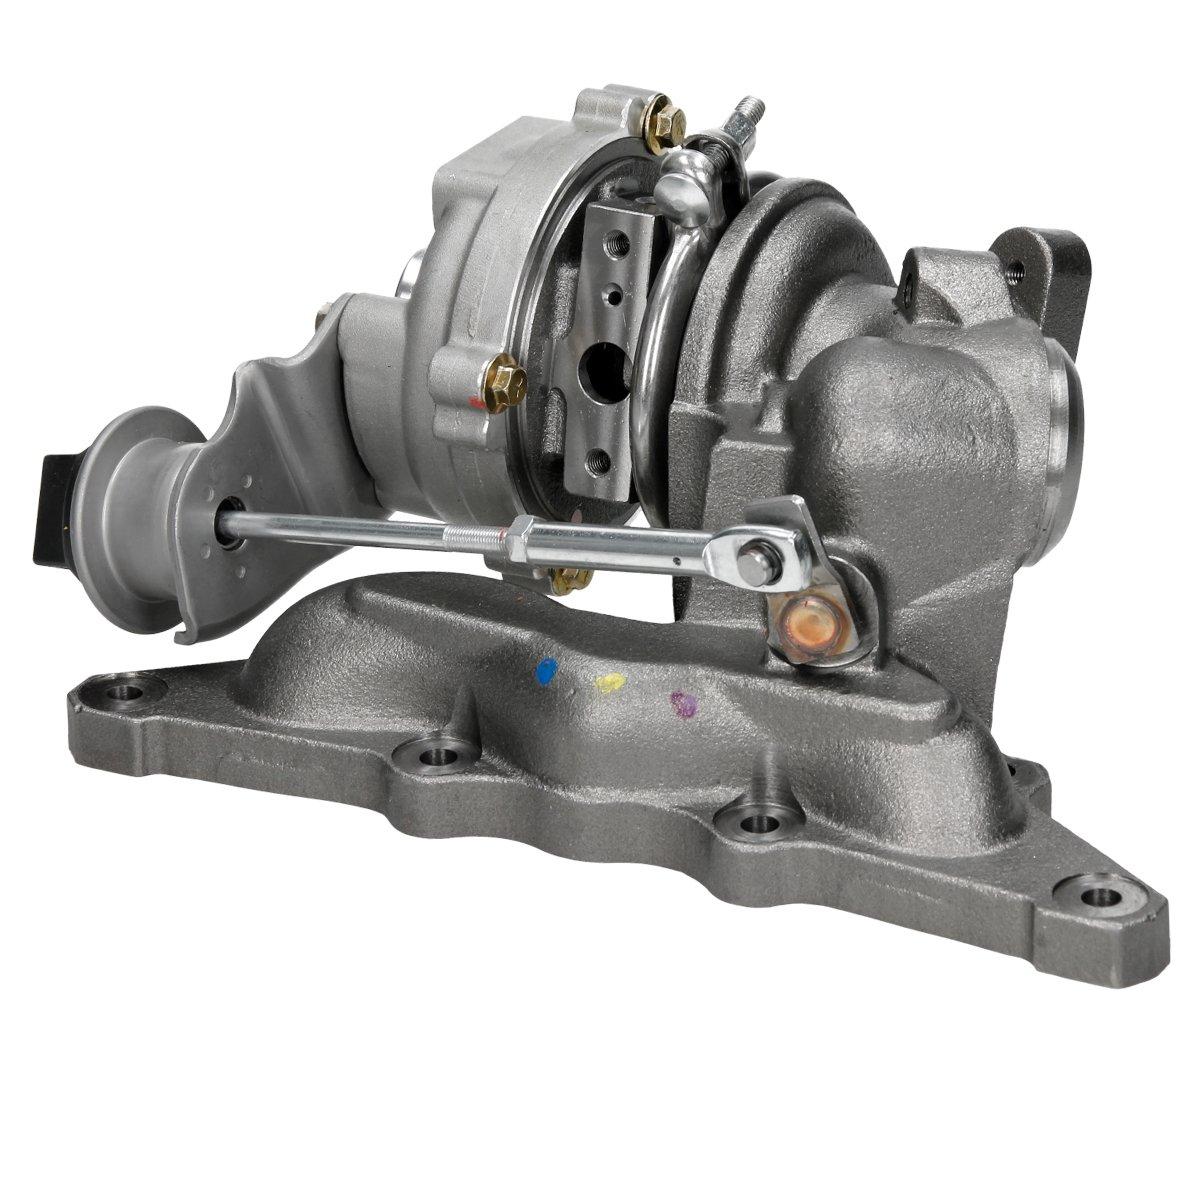 ECD Germany TL30-8245 Turbolader Abgas-Turbo-Lader Turbolader mit Kr/ümmer Abgaskr/ümmer